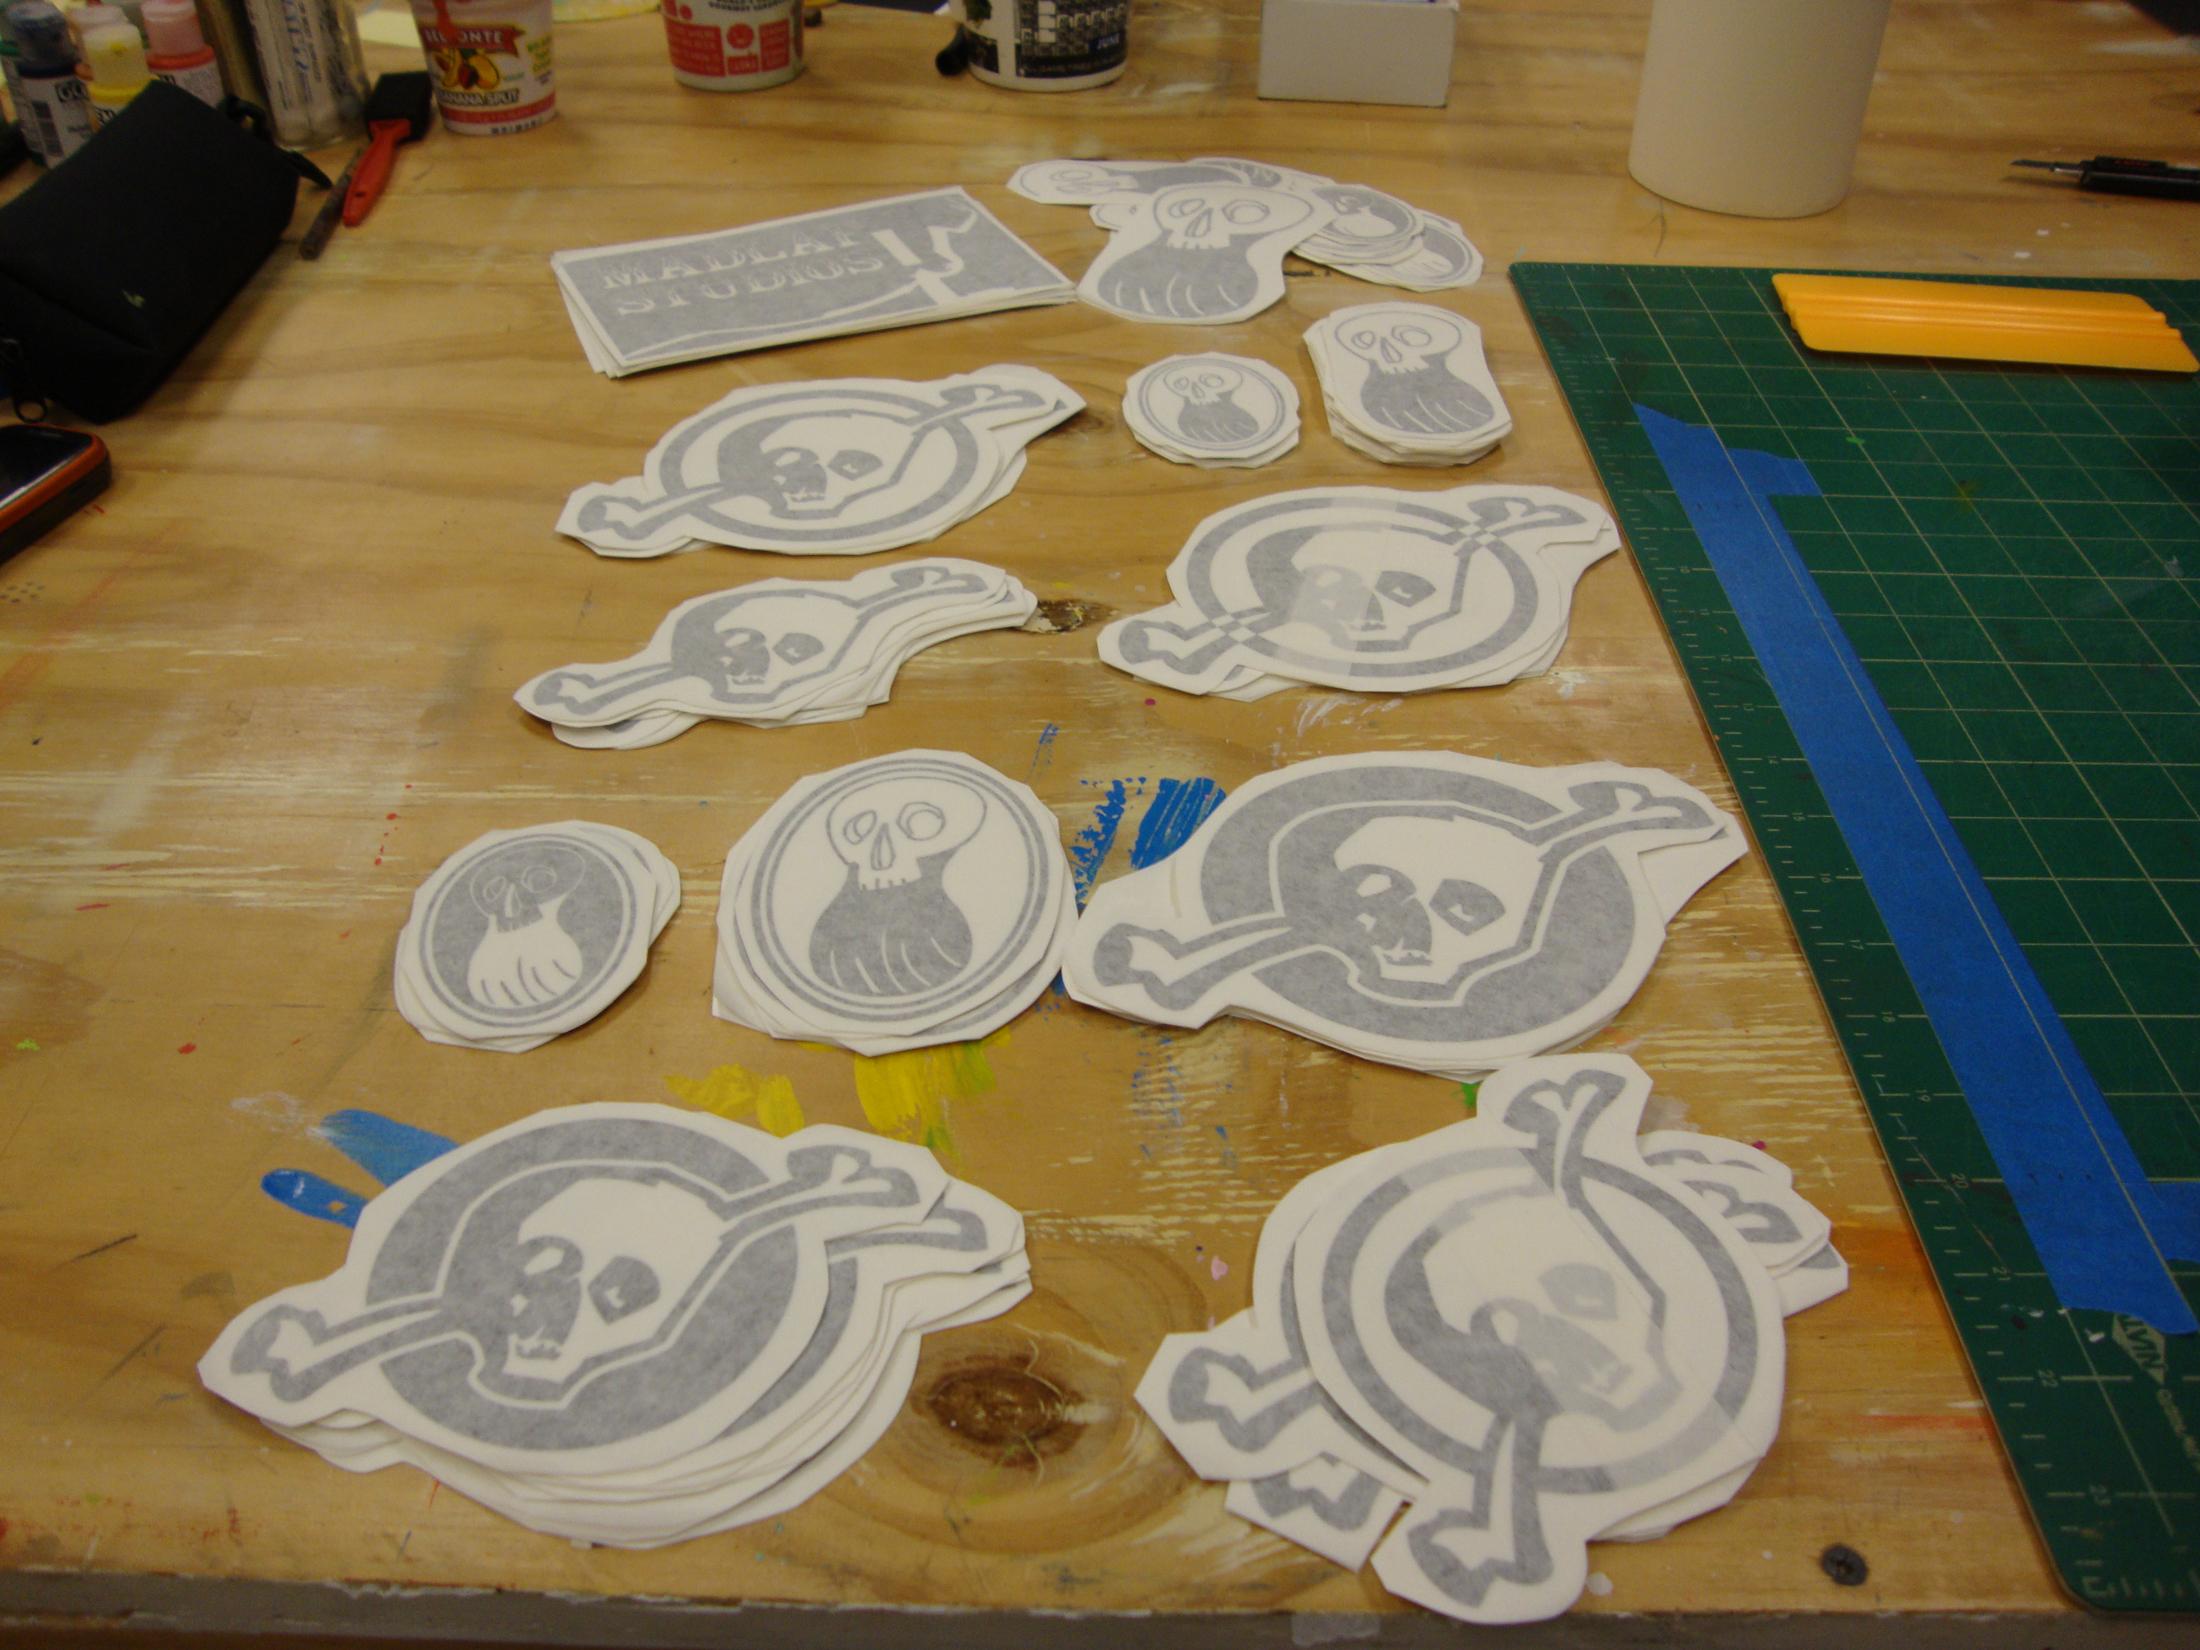 Vinyl Sticker Group.jpg